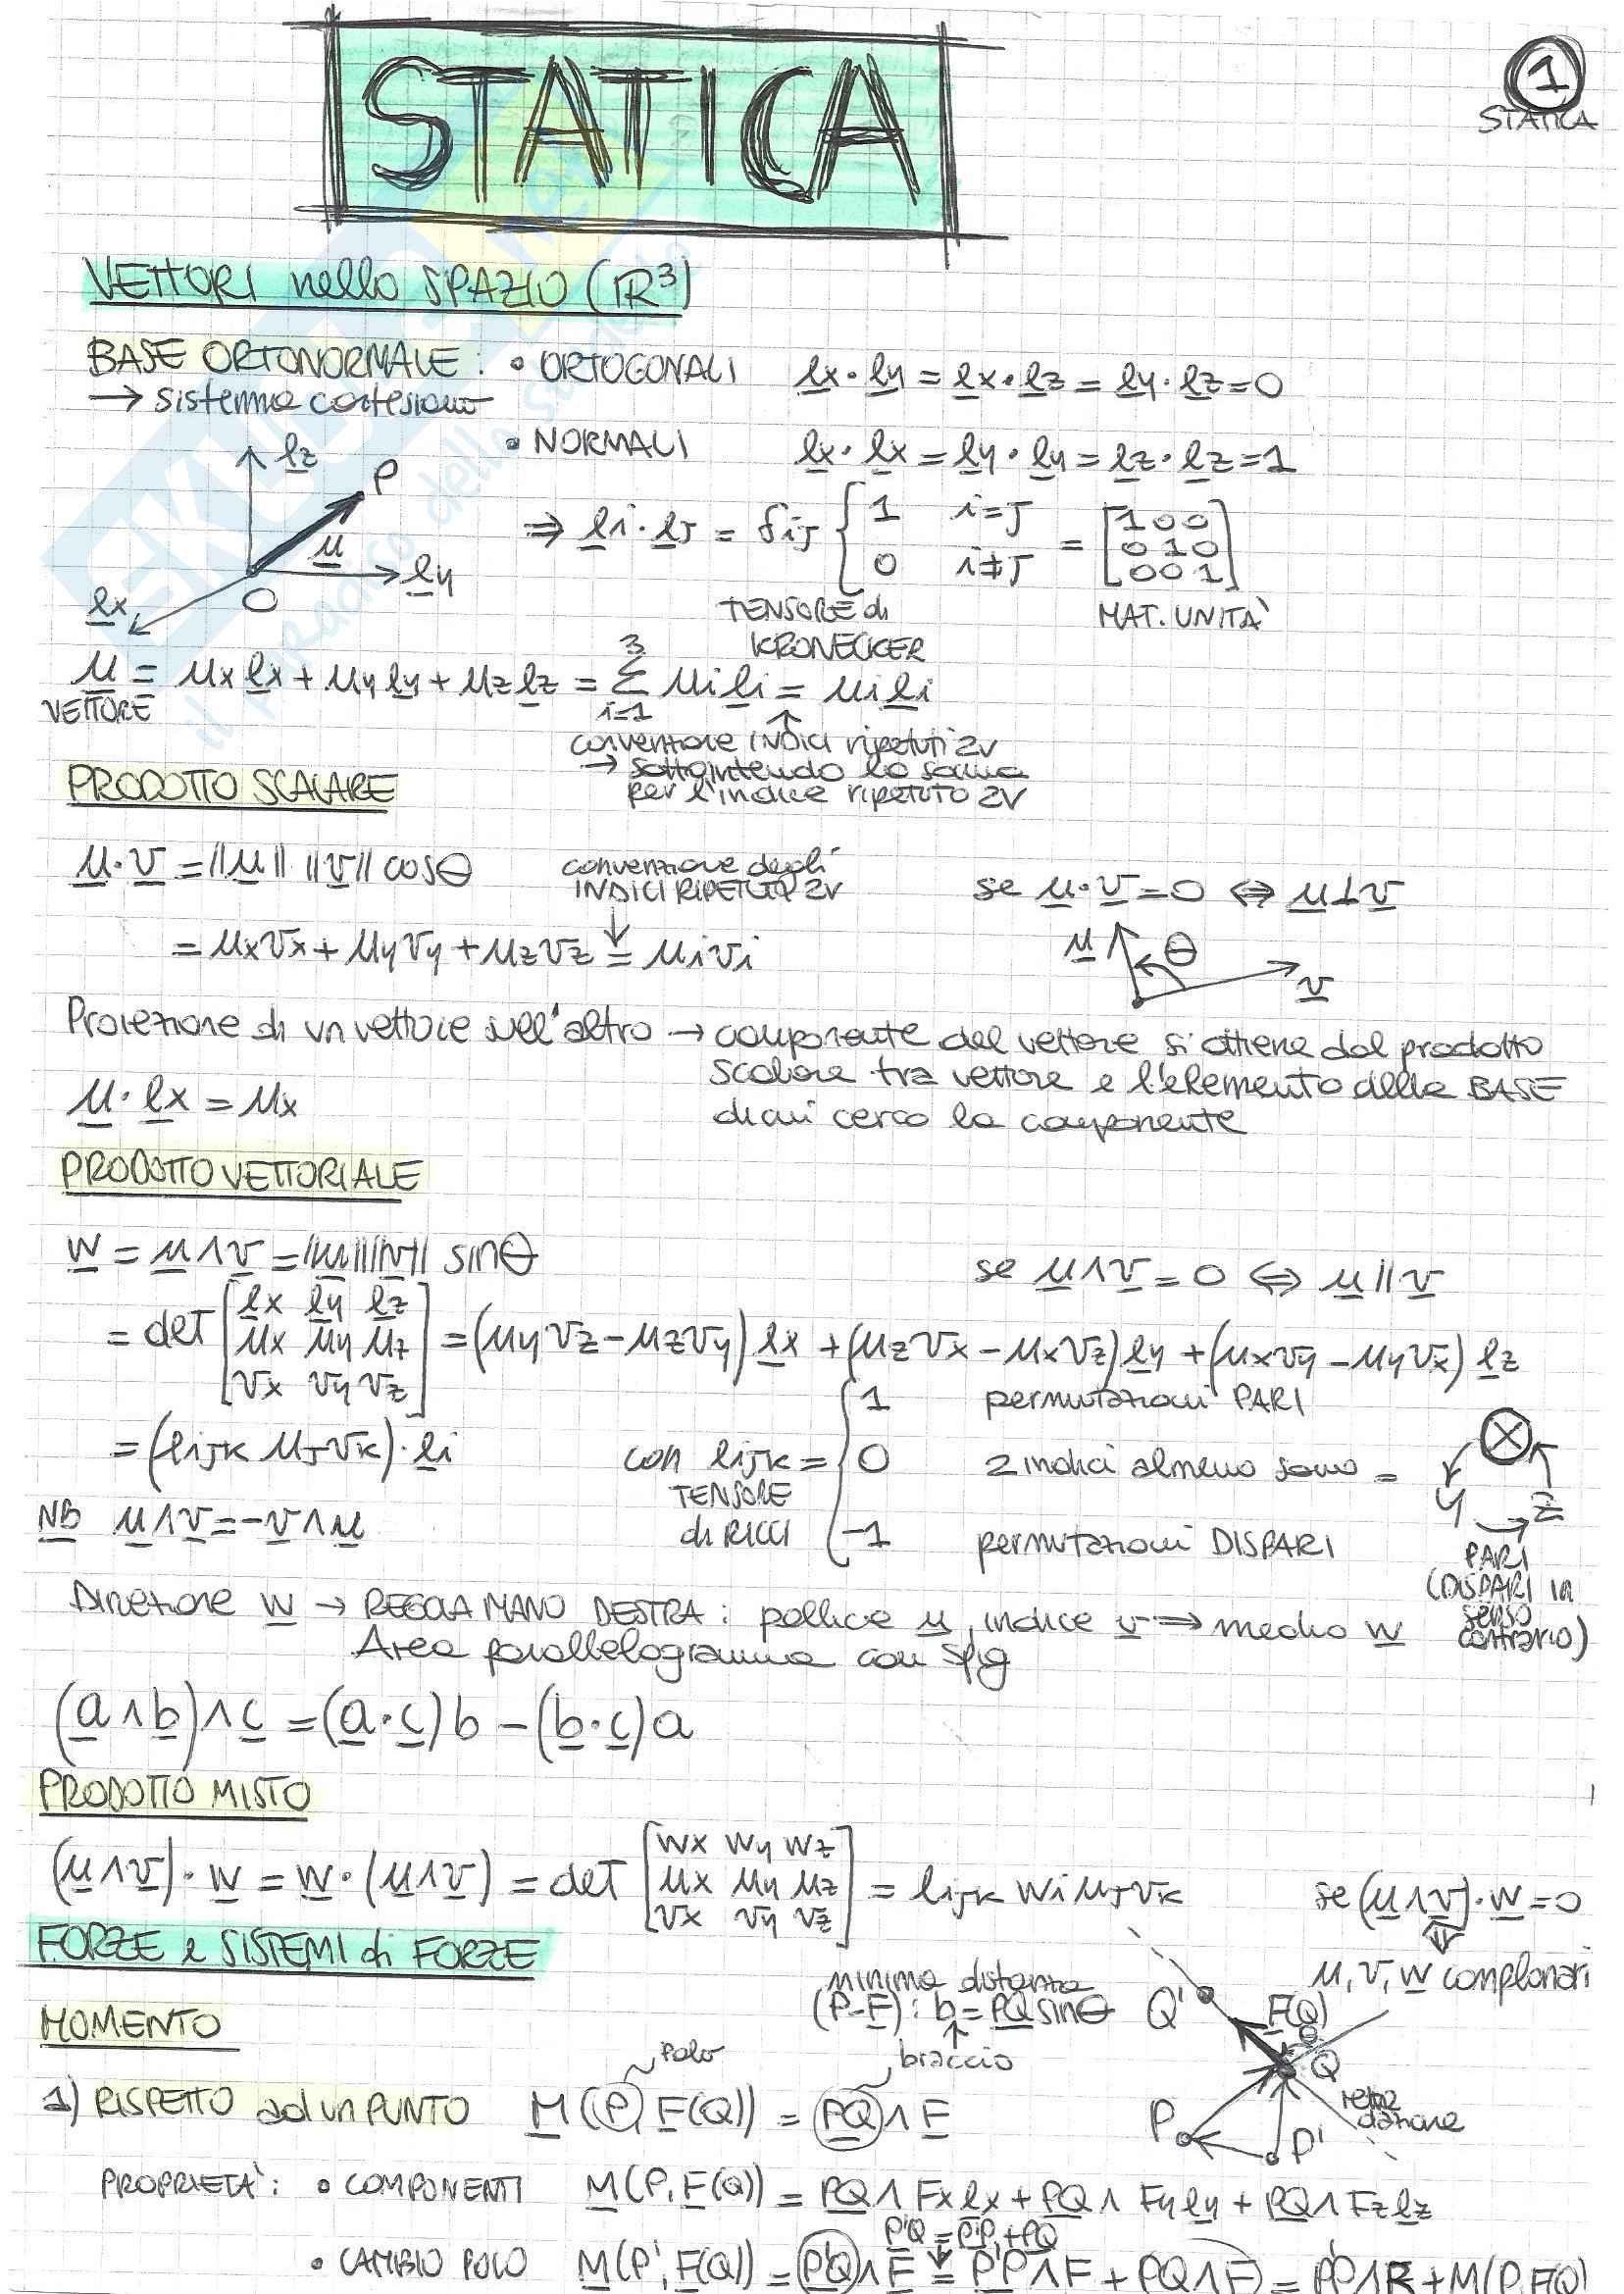 Statica - Teoria